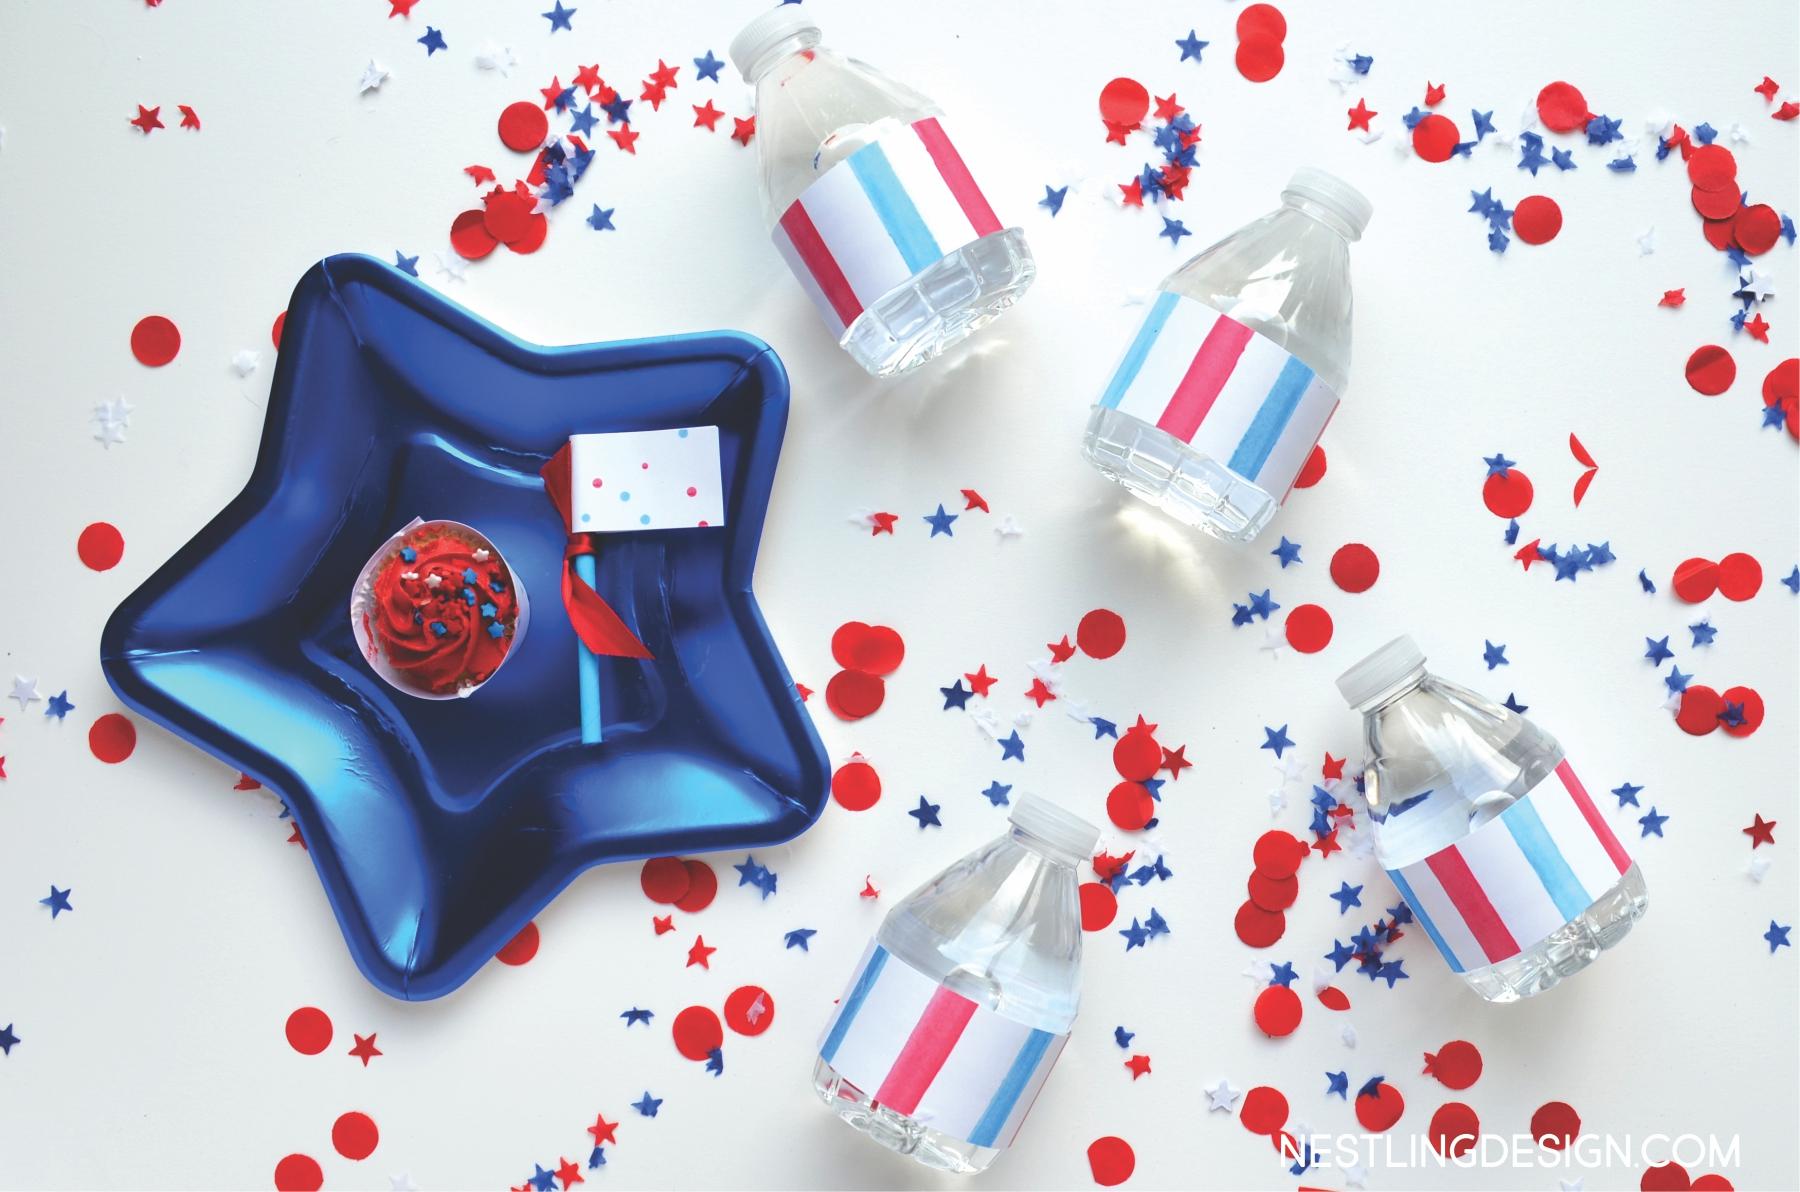 Patriotic Birthday Party | NestlingDesign.com